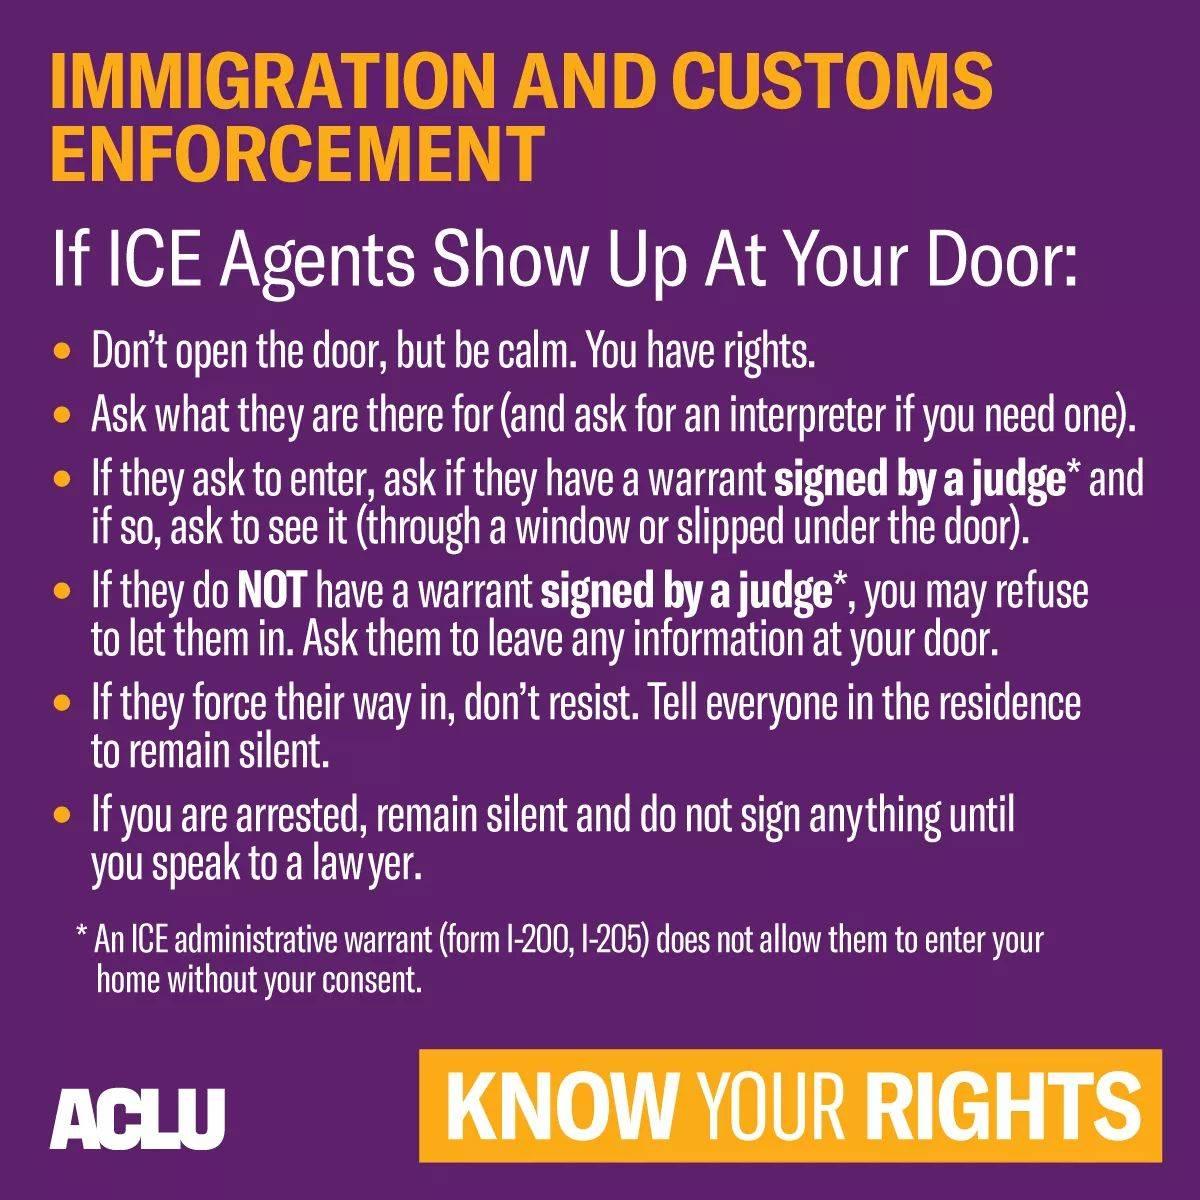 If ICE agents show up at your door, know your rights.Si agentes del ICE llegan a tu puerta, conoce tus derechos.